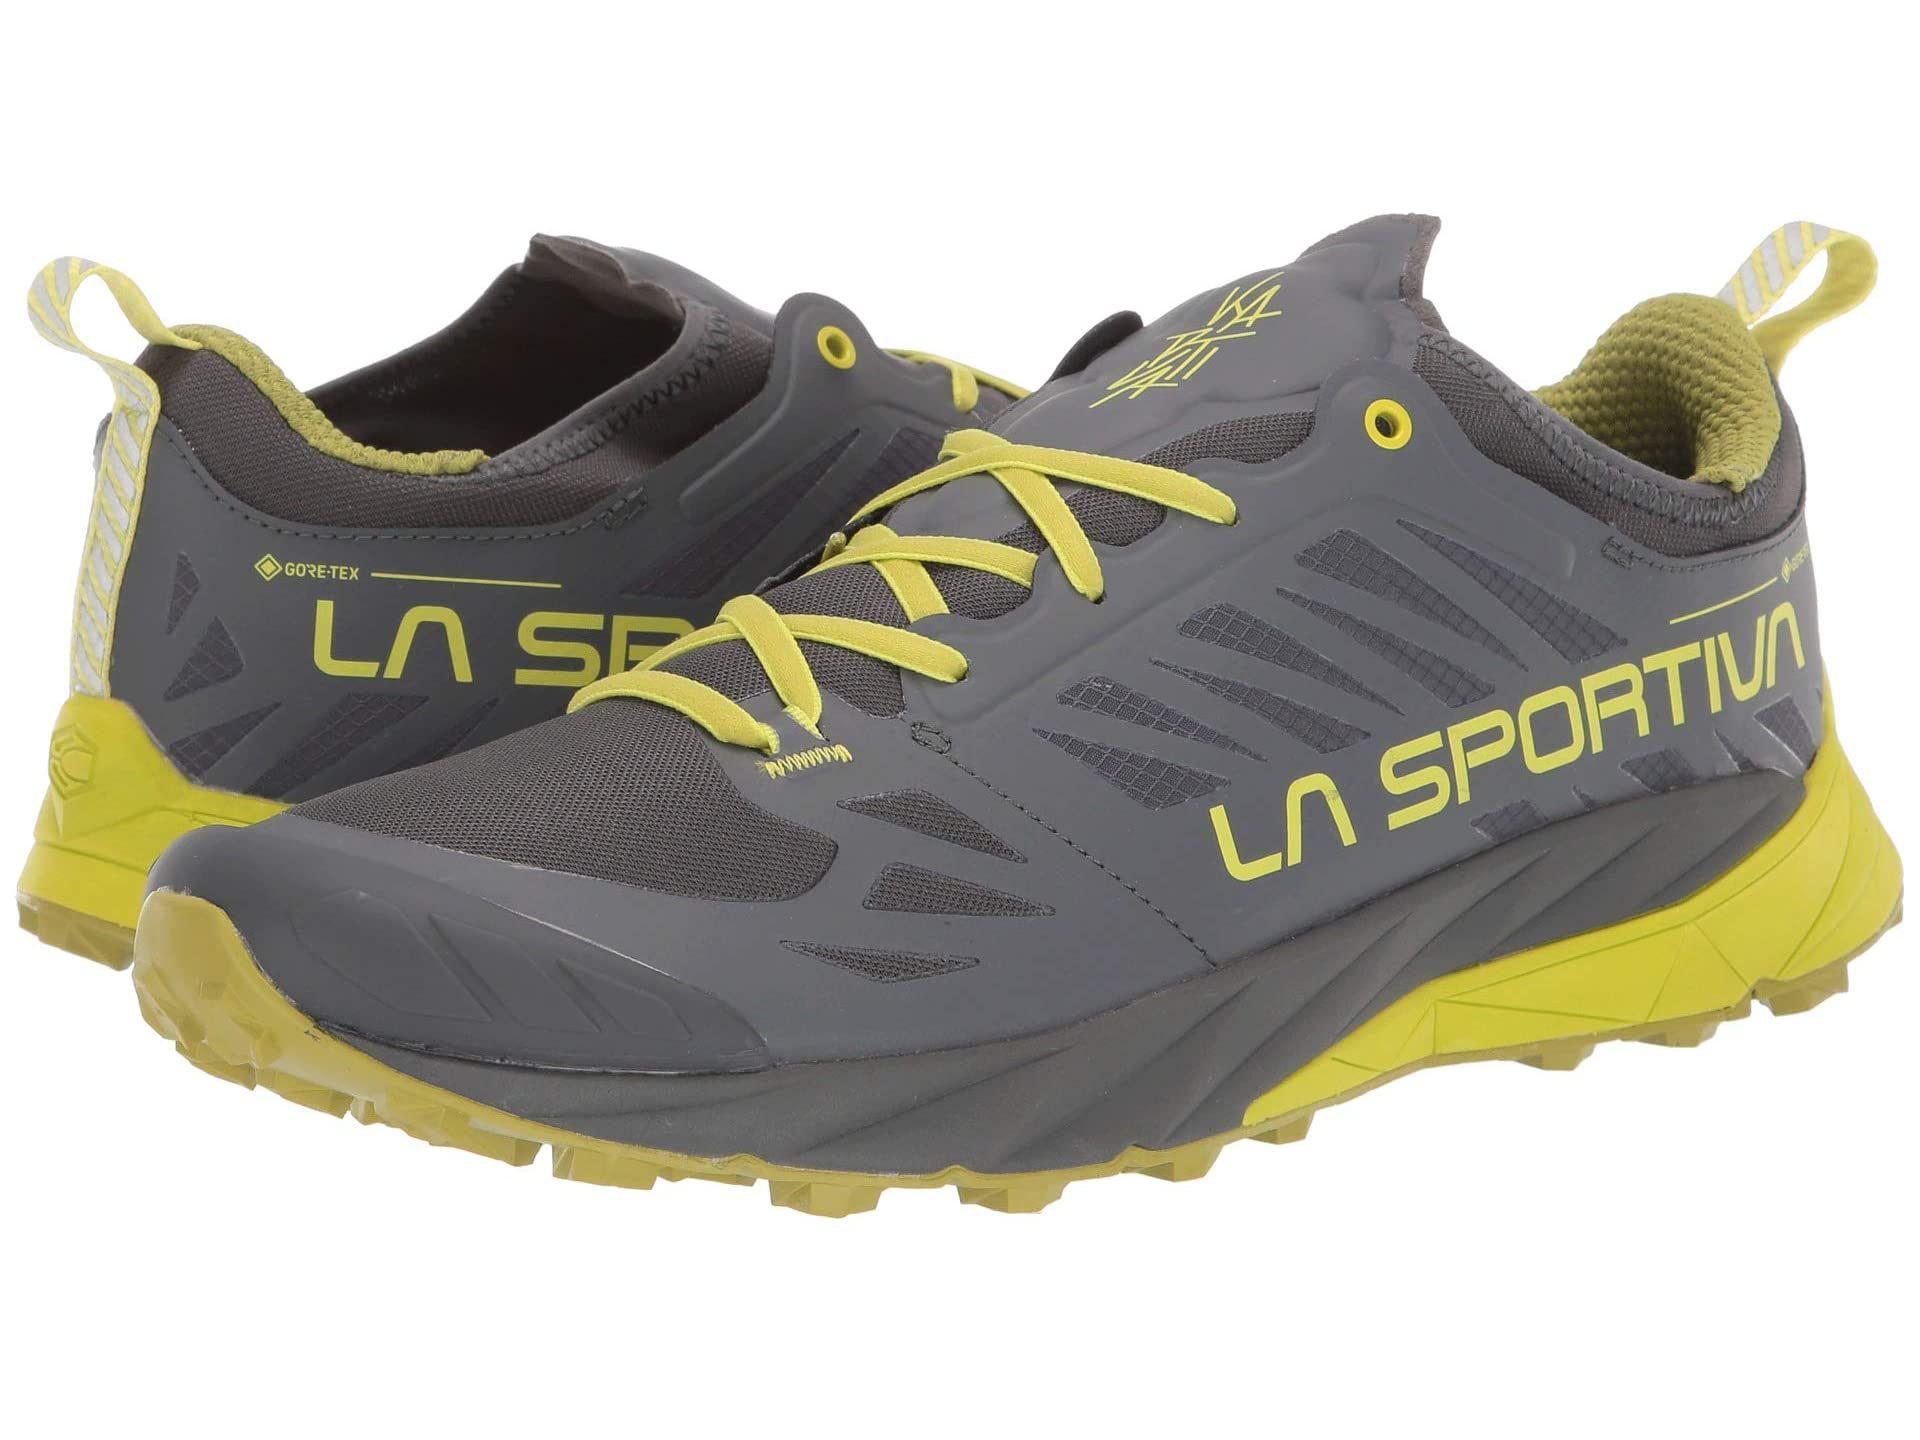 La Sportiva Kaptiva GTX shoe